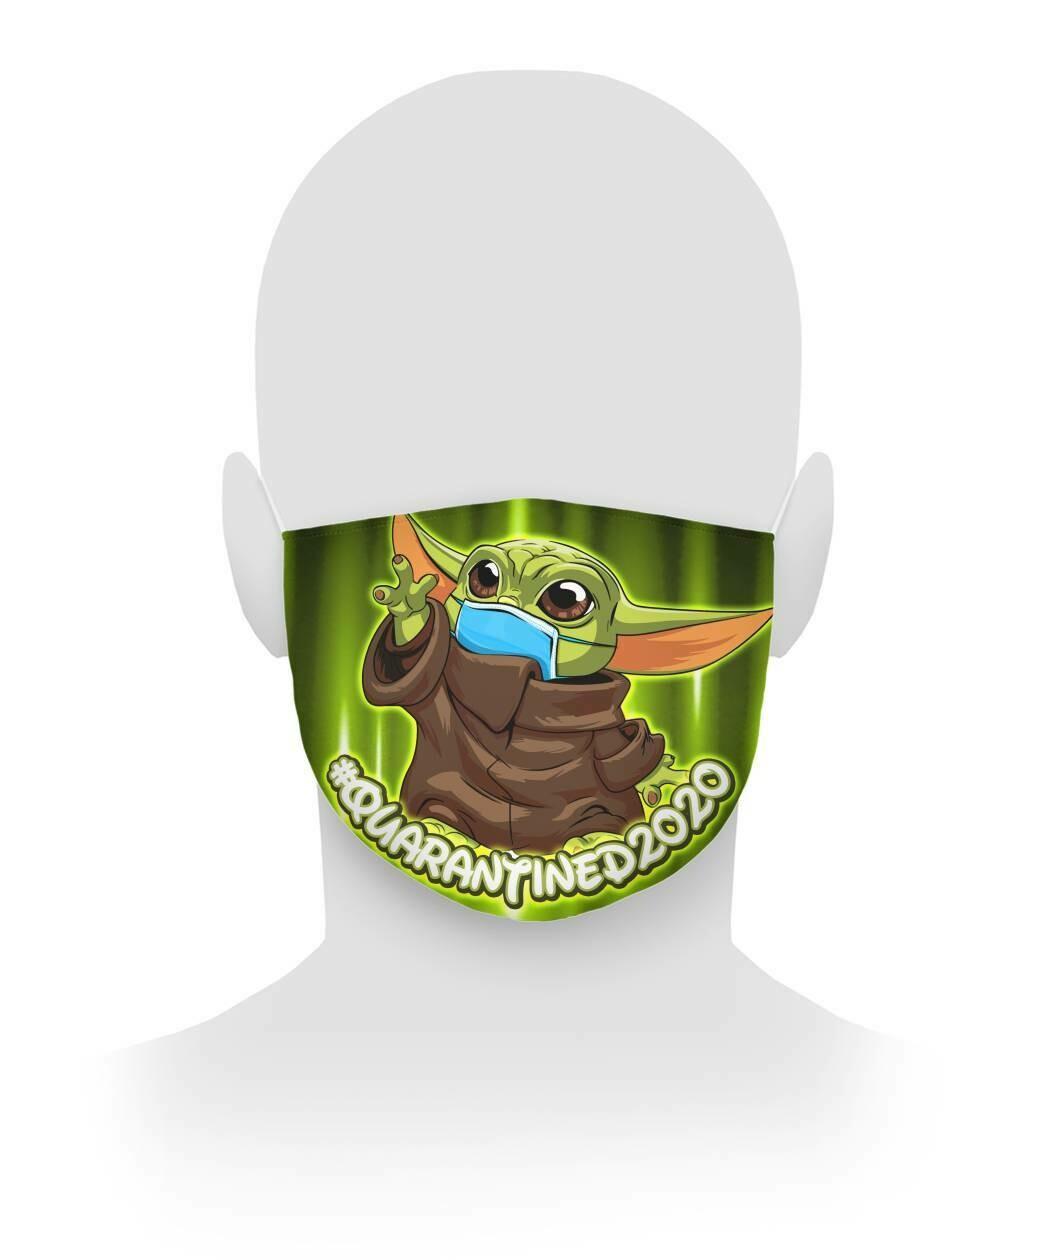 Baby Yoda Quarantined 2020 Face Mask